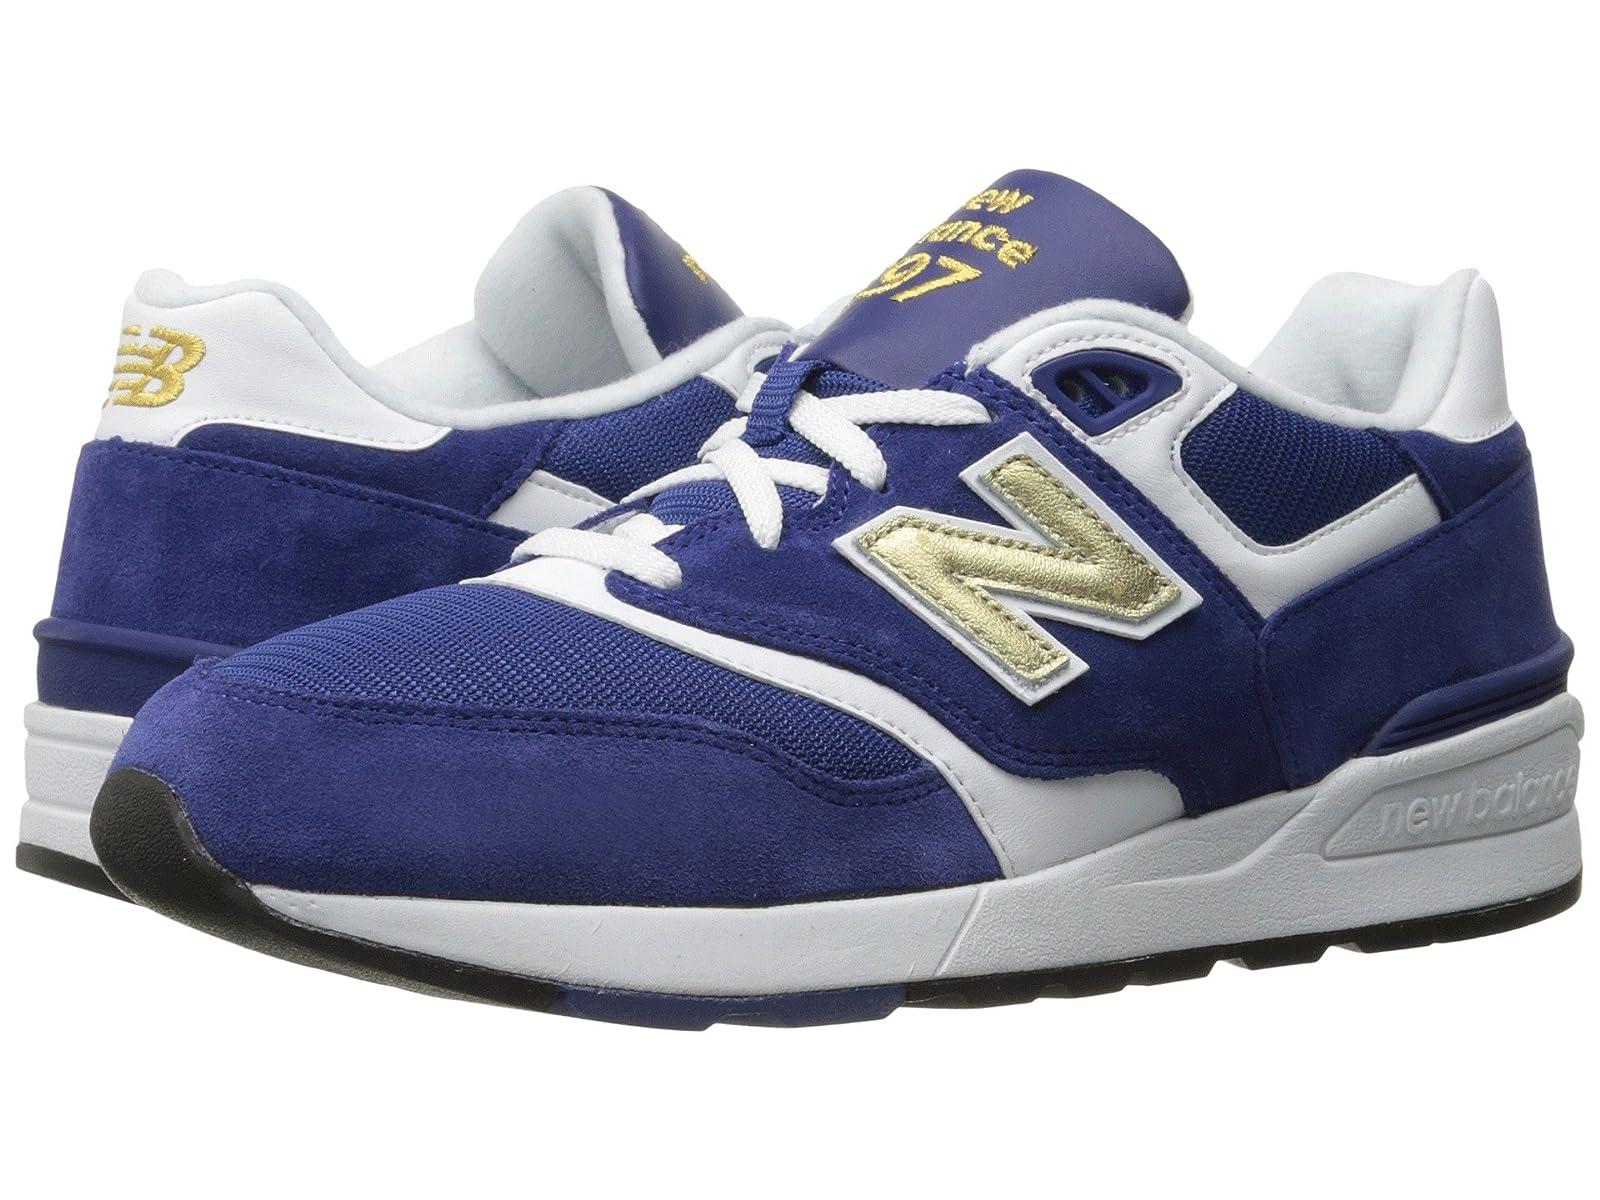 New Balance Classics ML597Cheap and distinctive eye-catching shoes